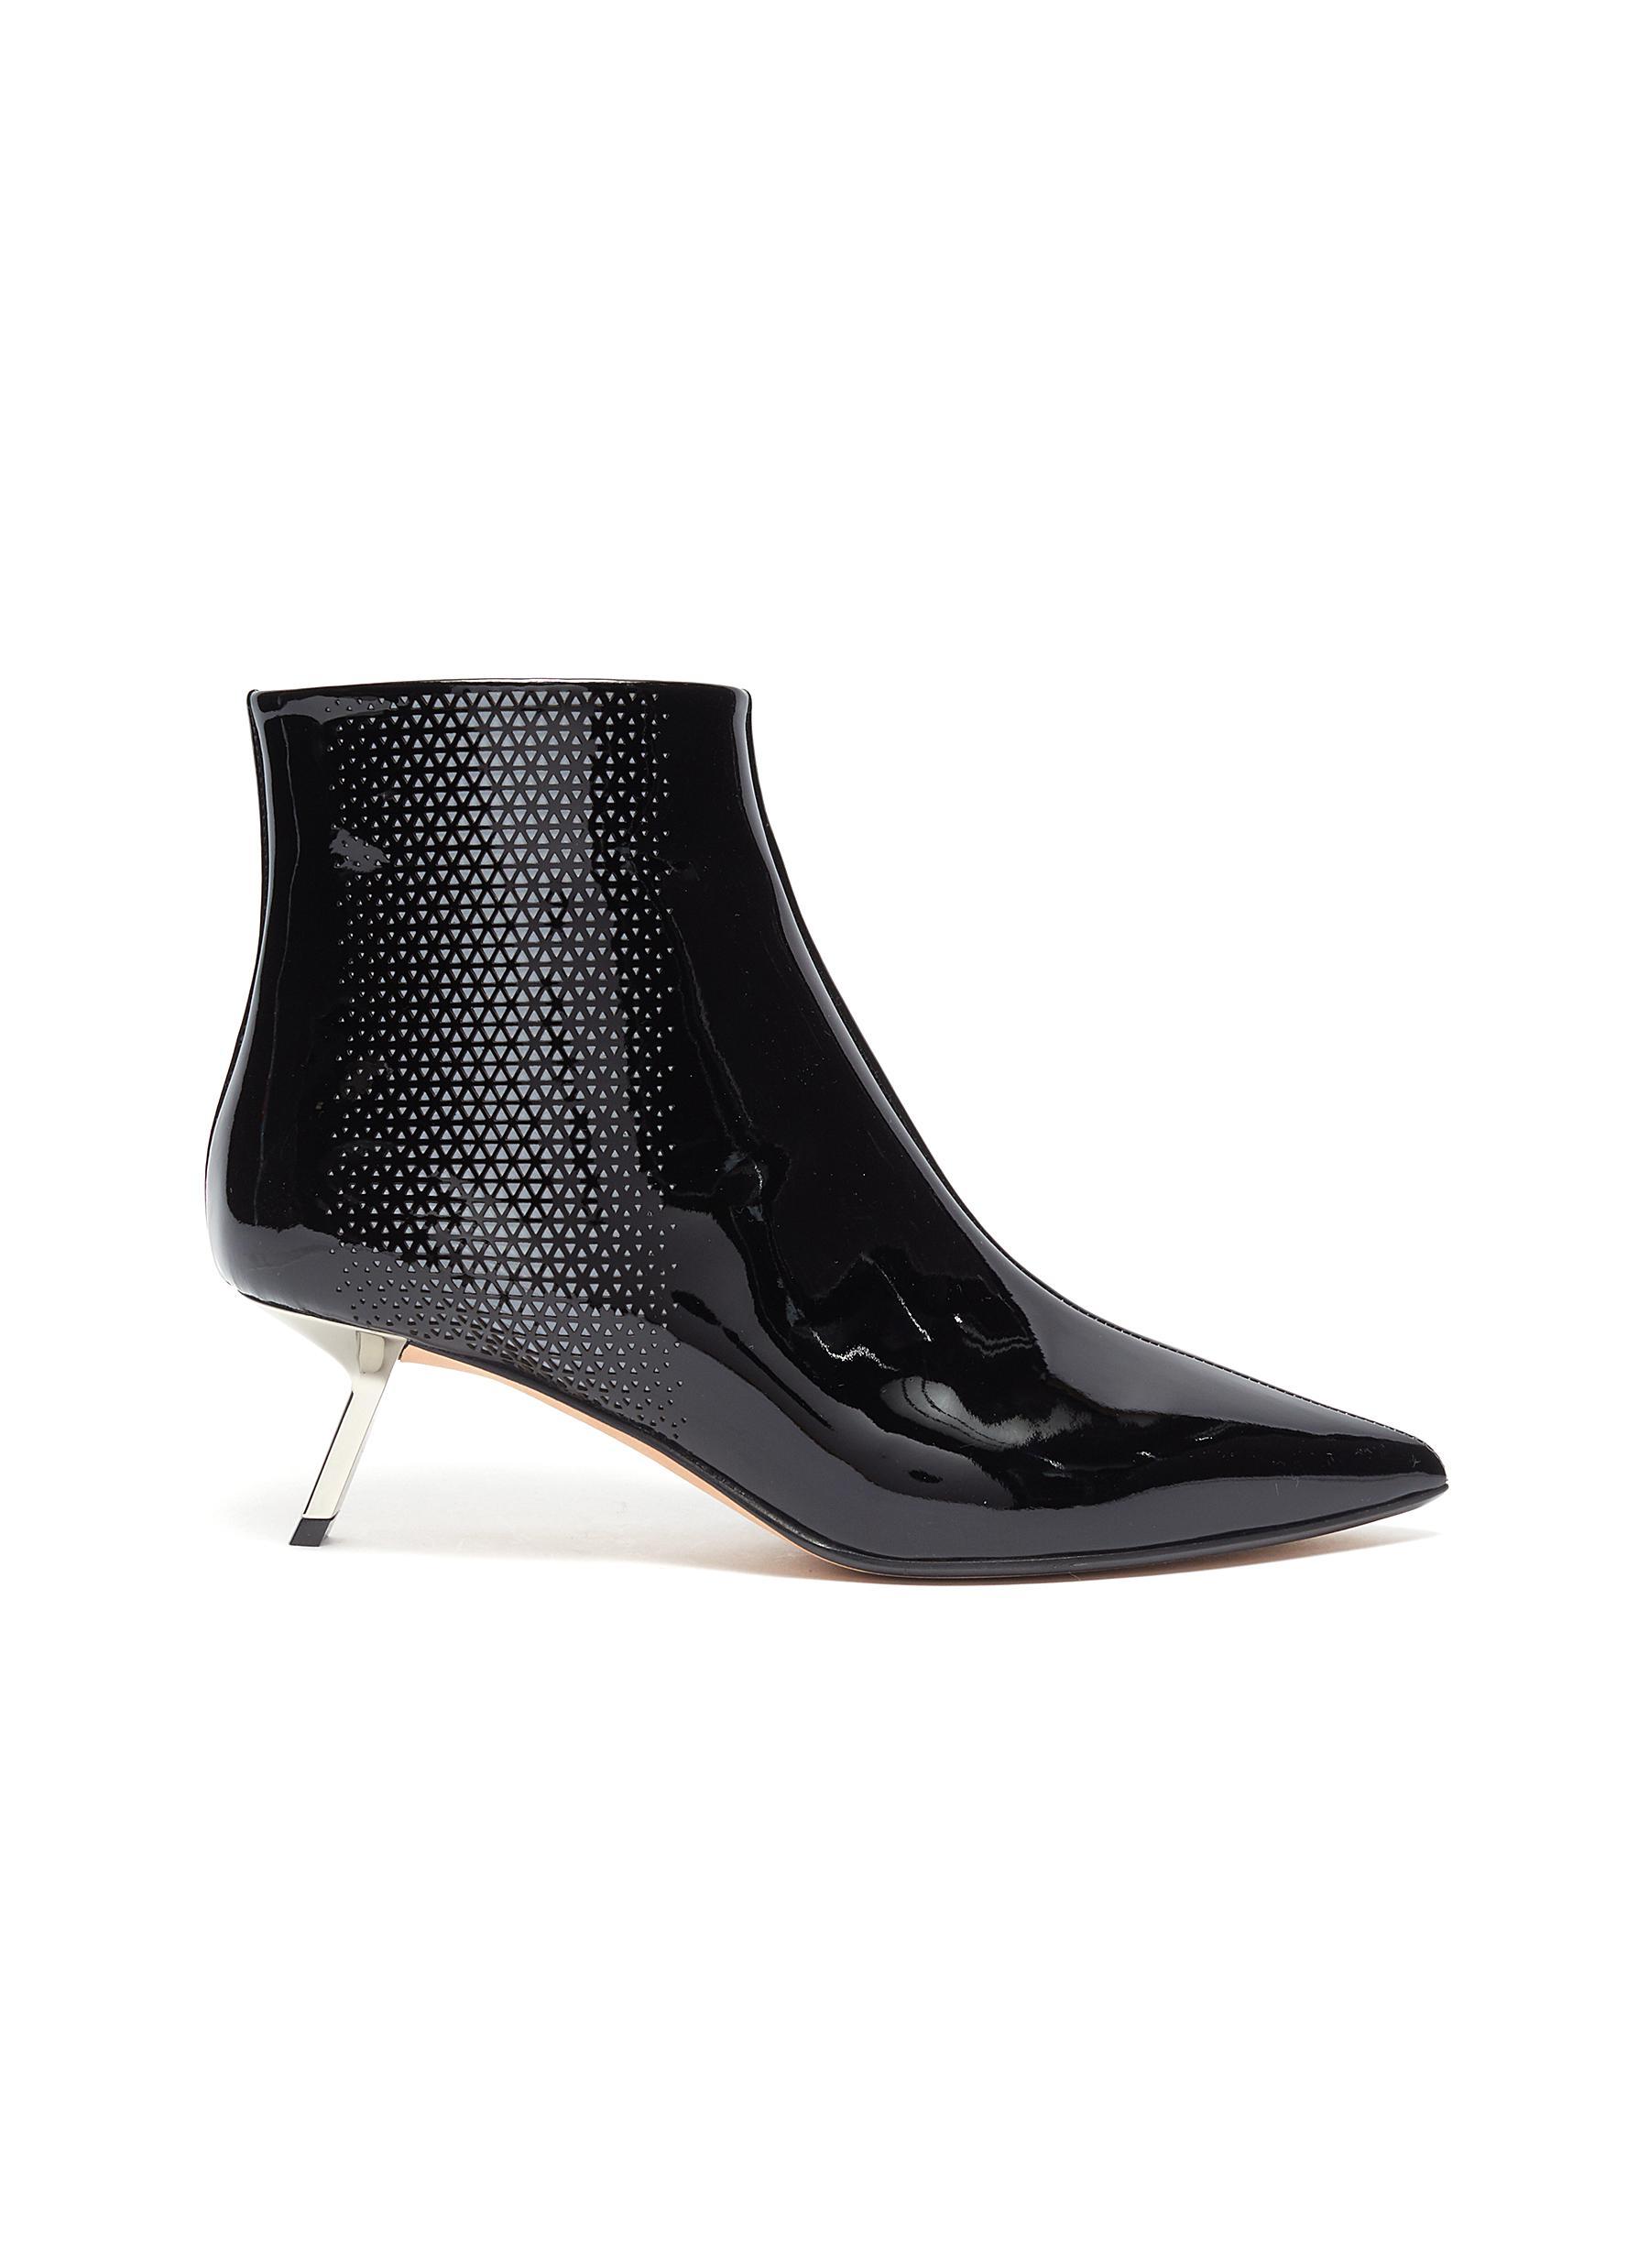 Libra cutout triangle patent leather ankle boots by Alchimia Di Ballin